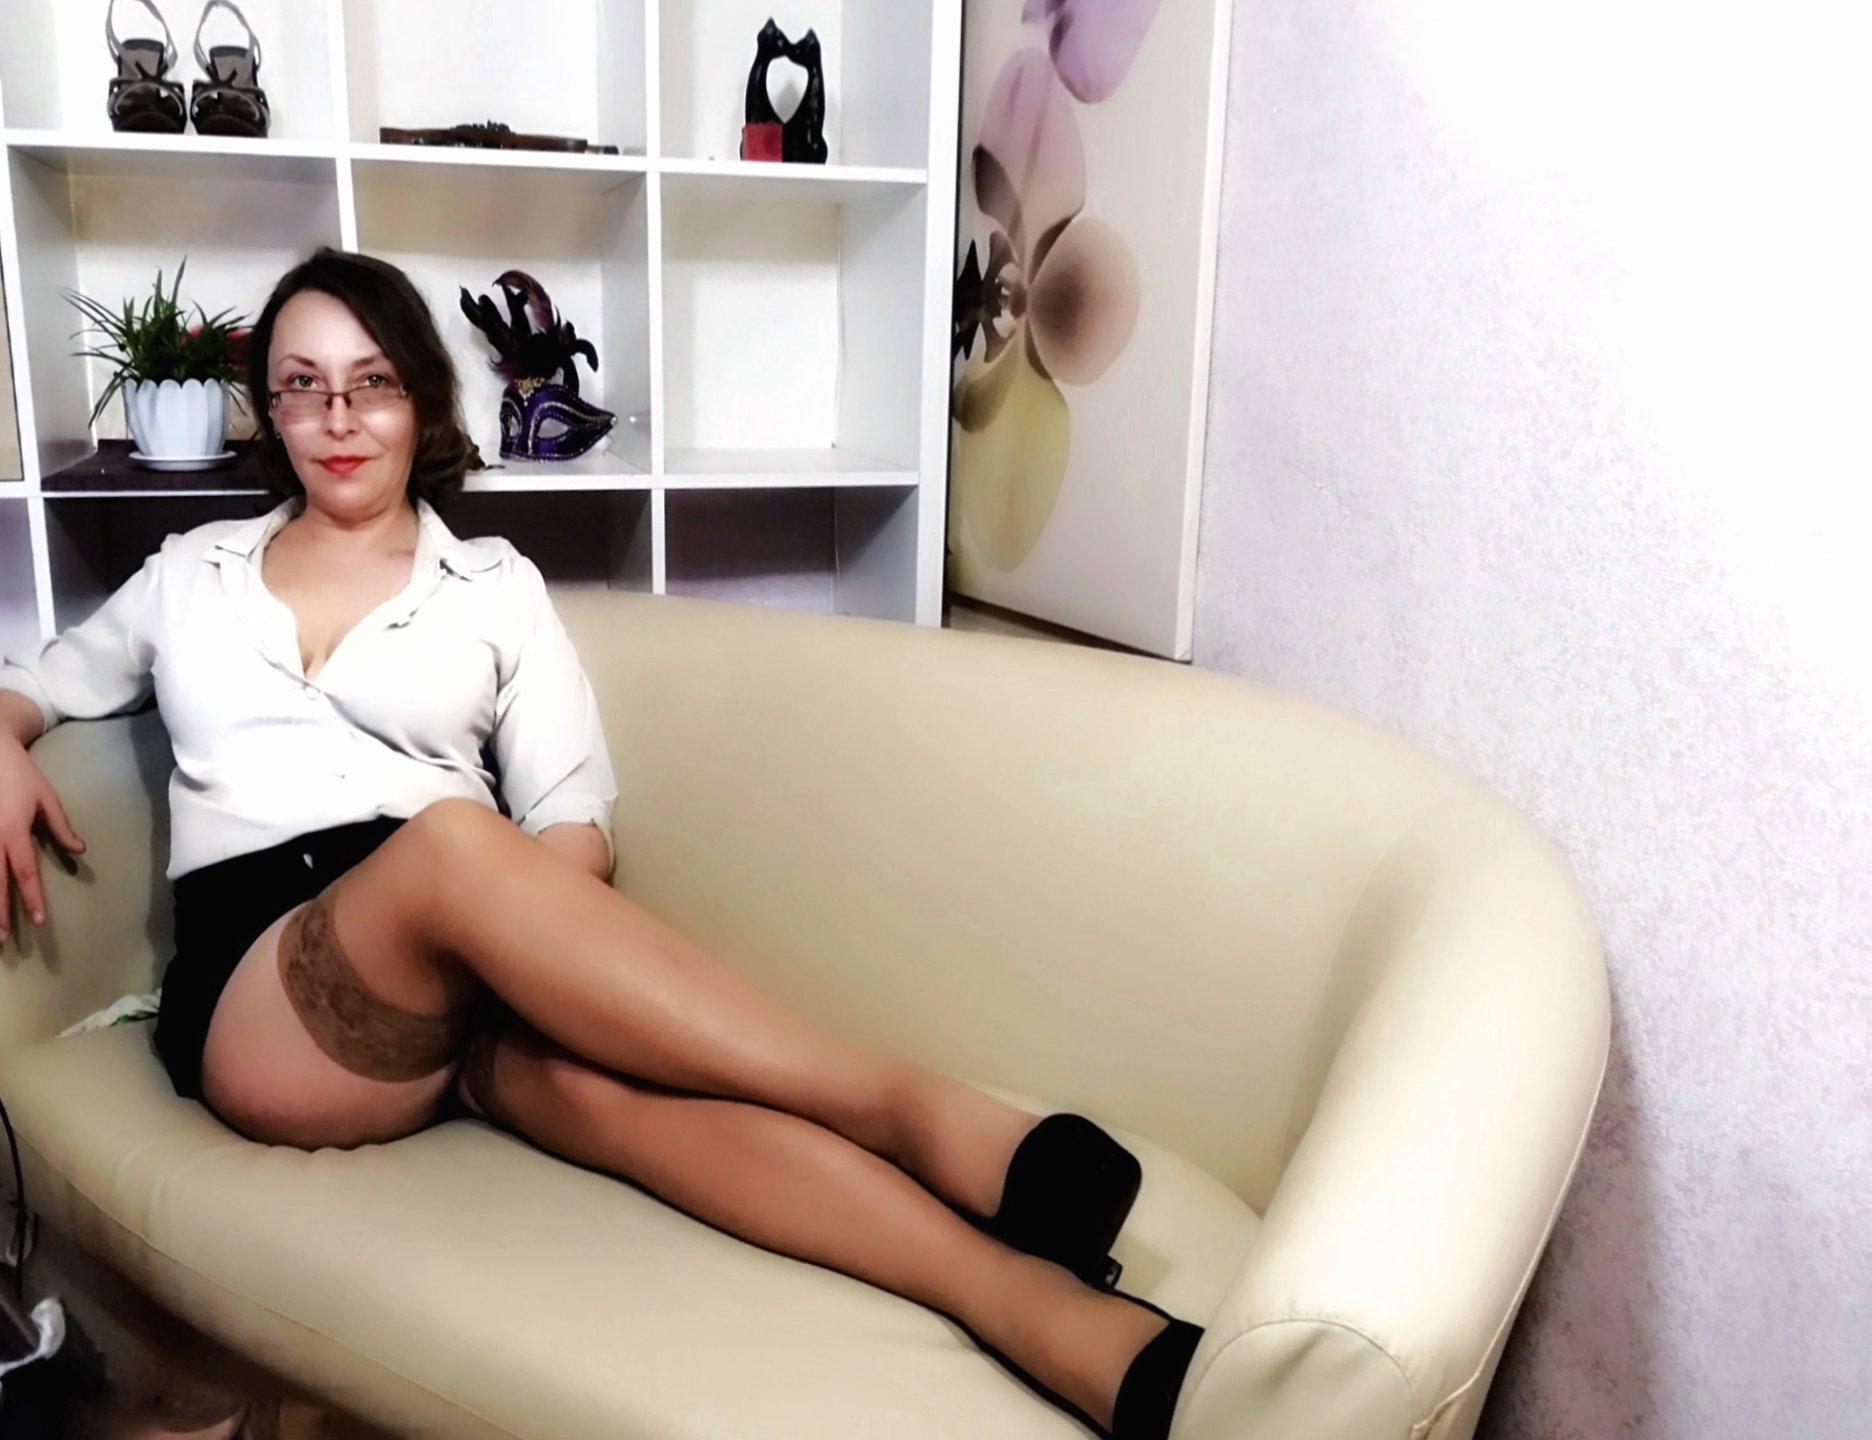 Chaud adolescent fille a sexe